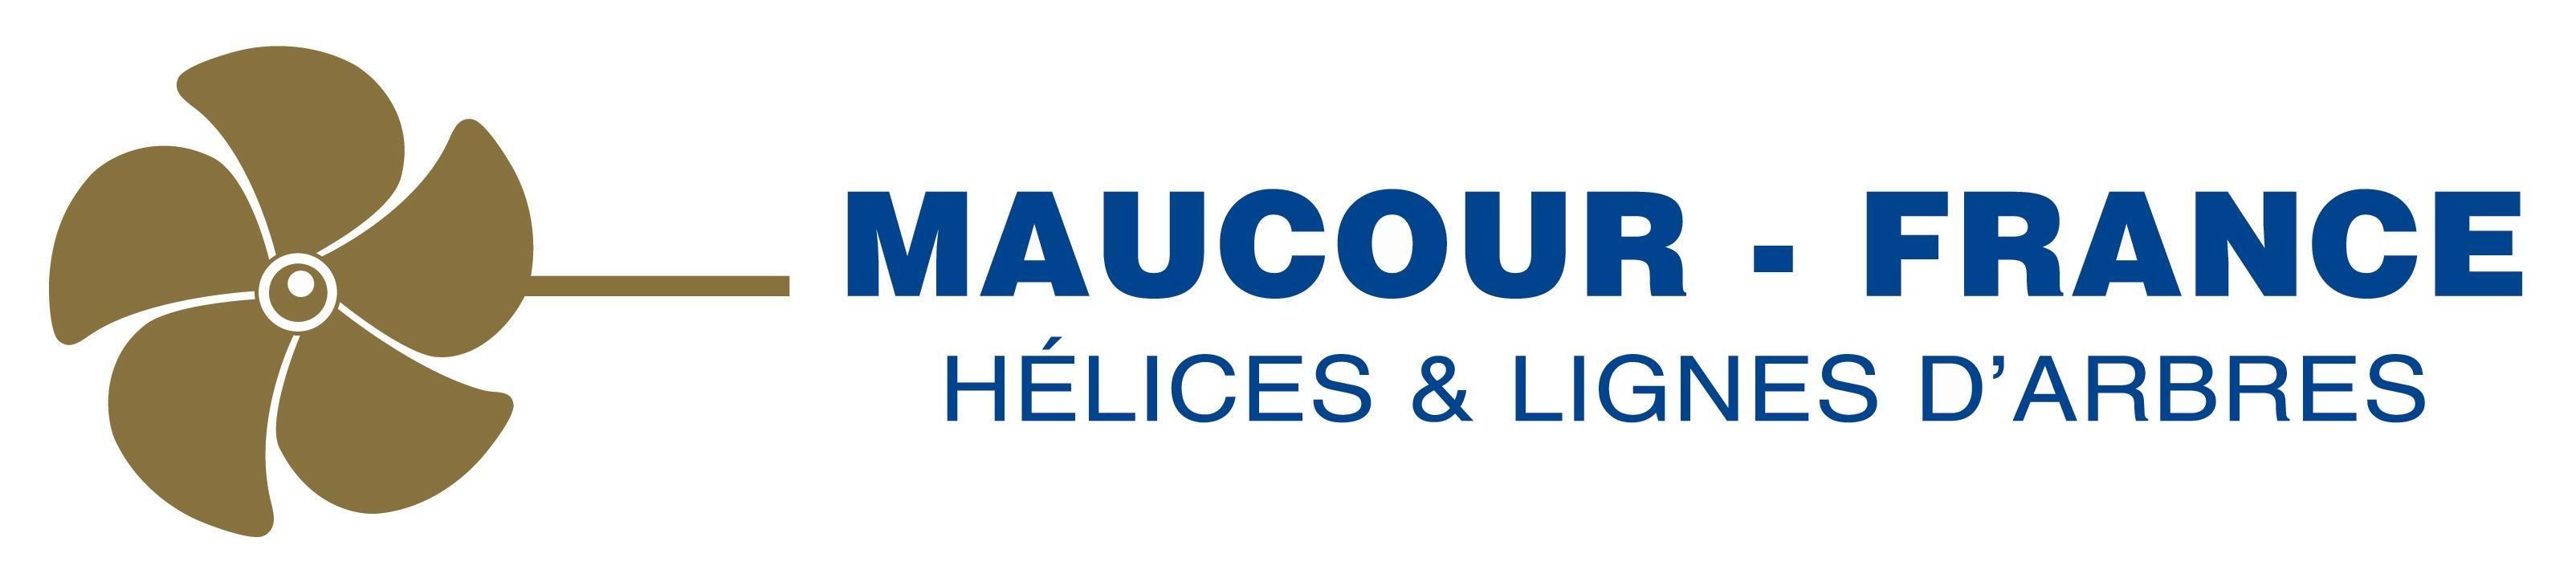 MAUCOUR